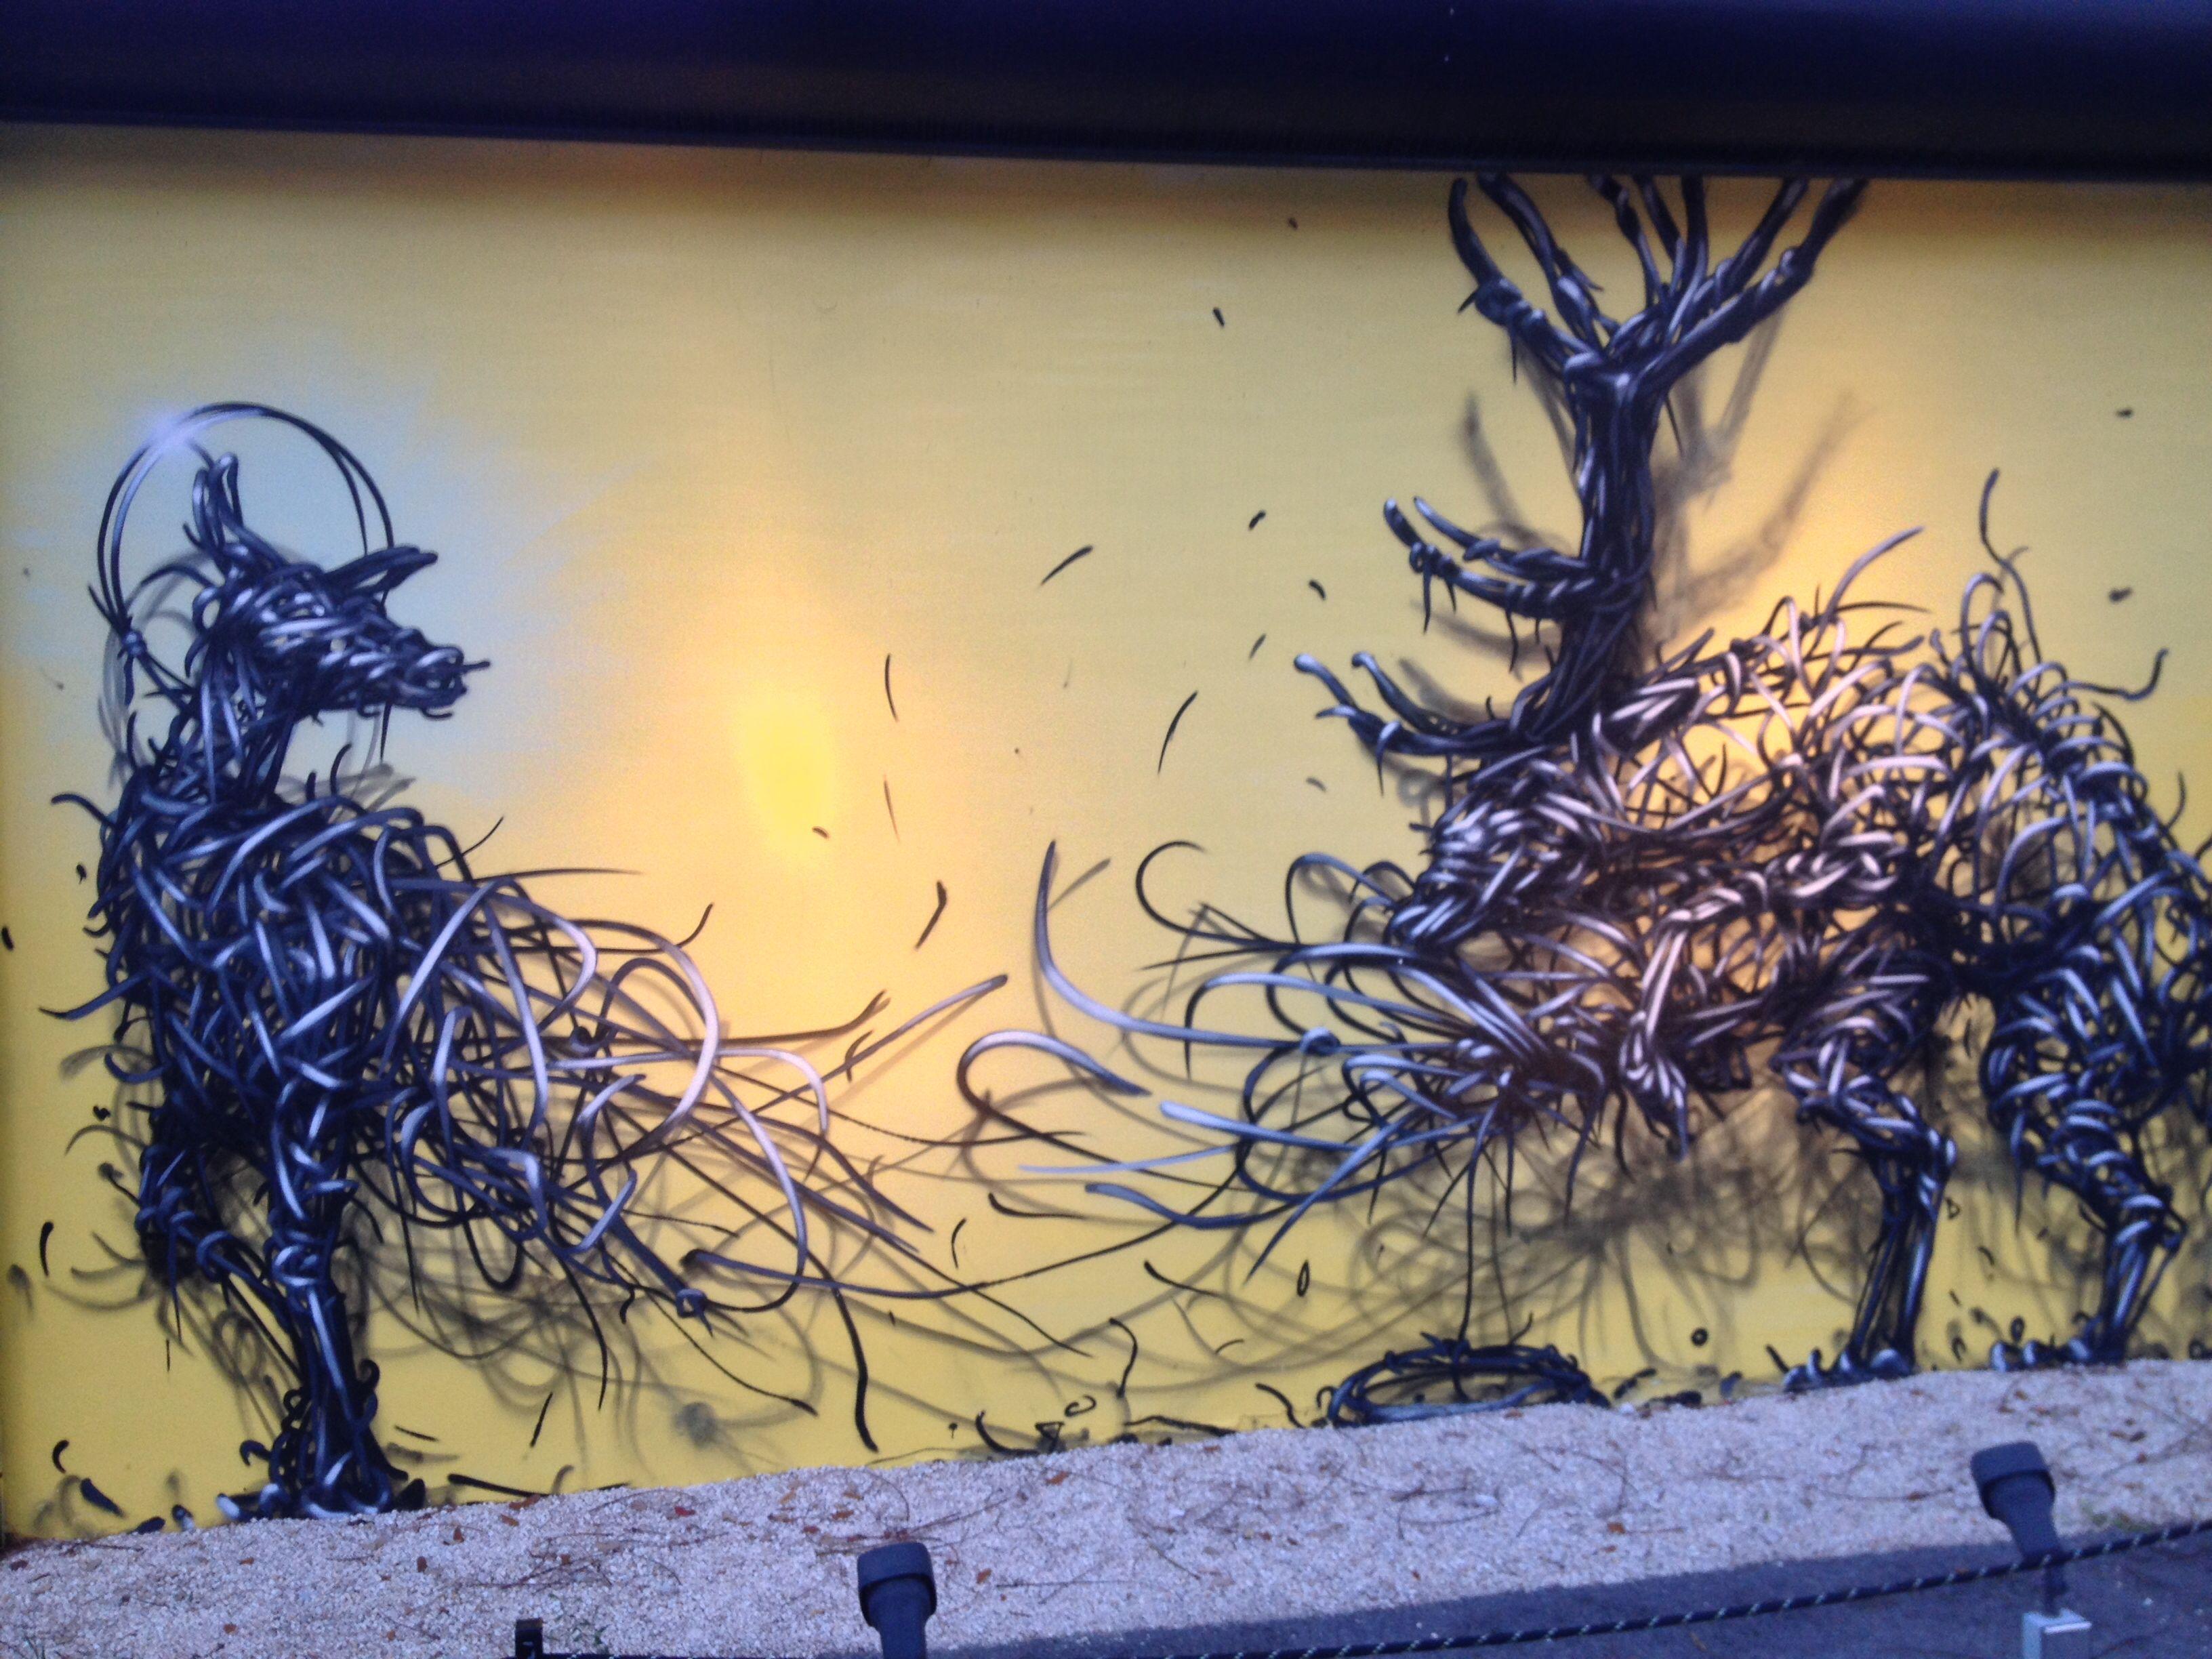 Wynwood Walls | art pics | Pinterest | Art pics